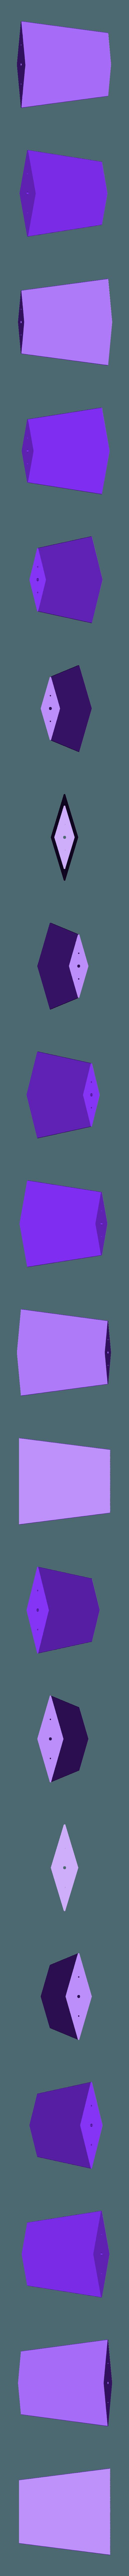 Sharpened Nail 3.stl Download STL file Hollow Knight Sharpened Nail • 3D printable design, glargonoid